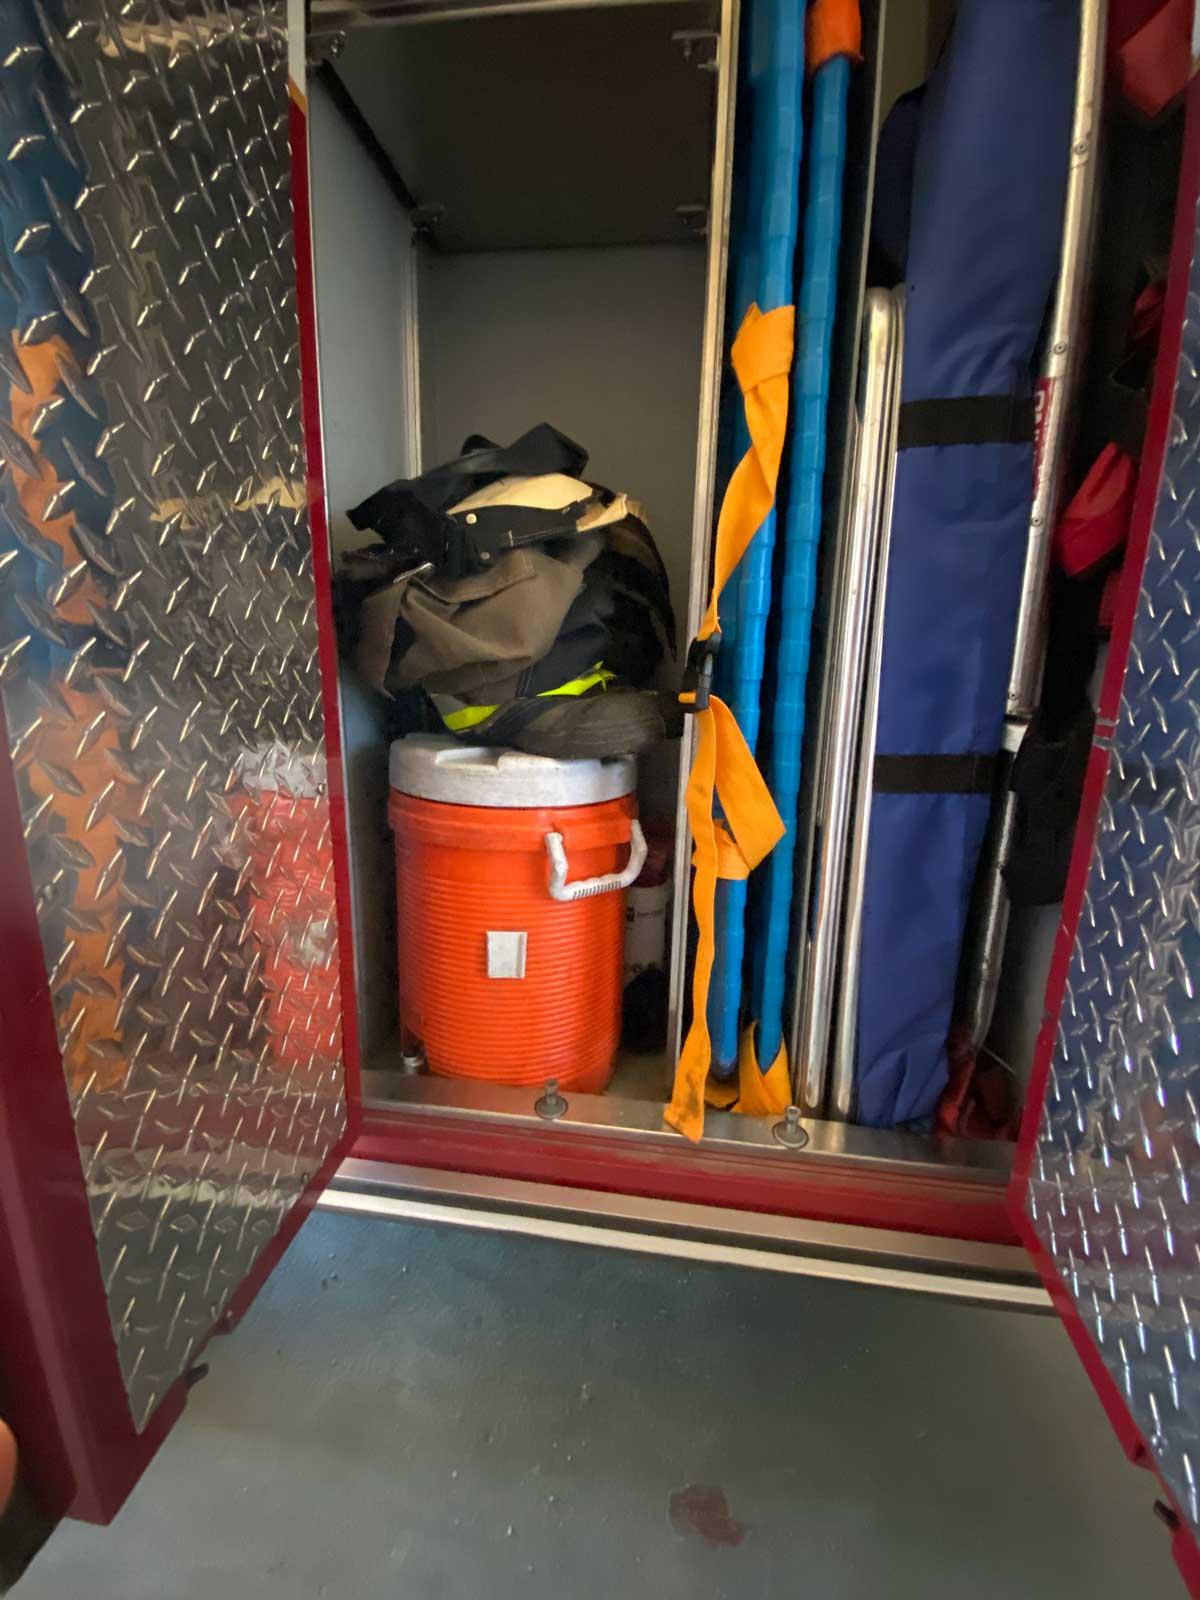 More firefighter gear inside a fire truck compartment